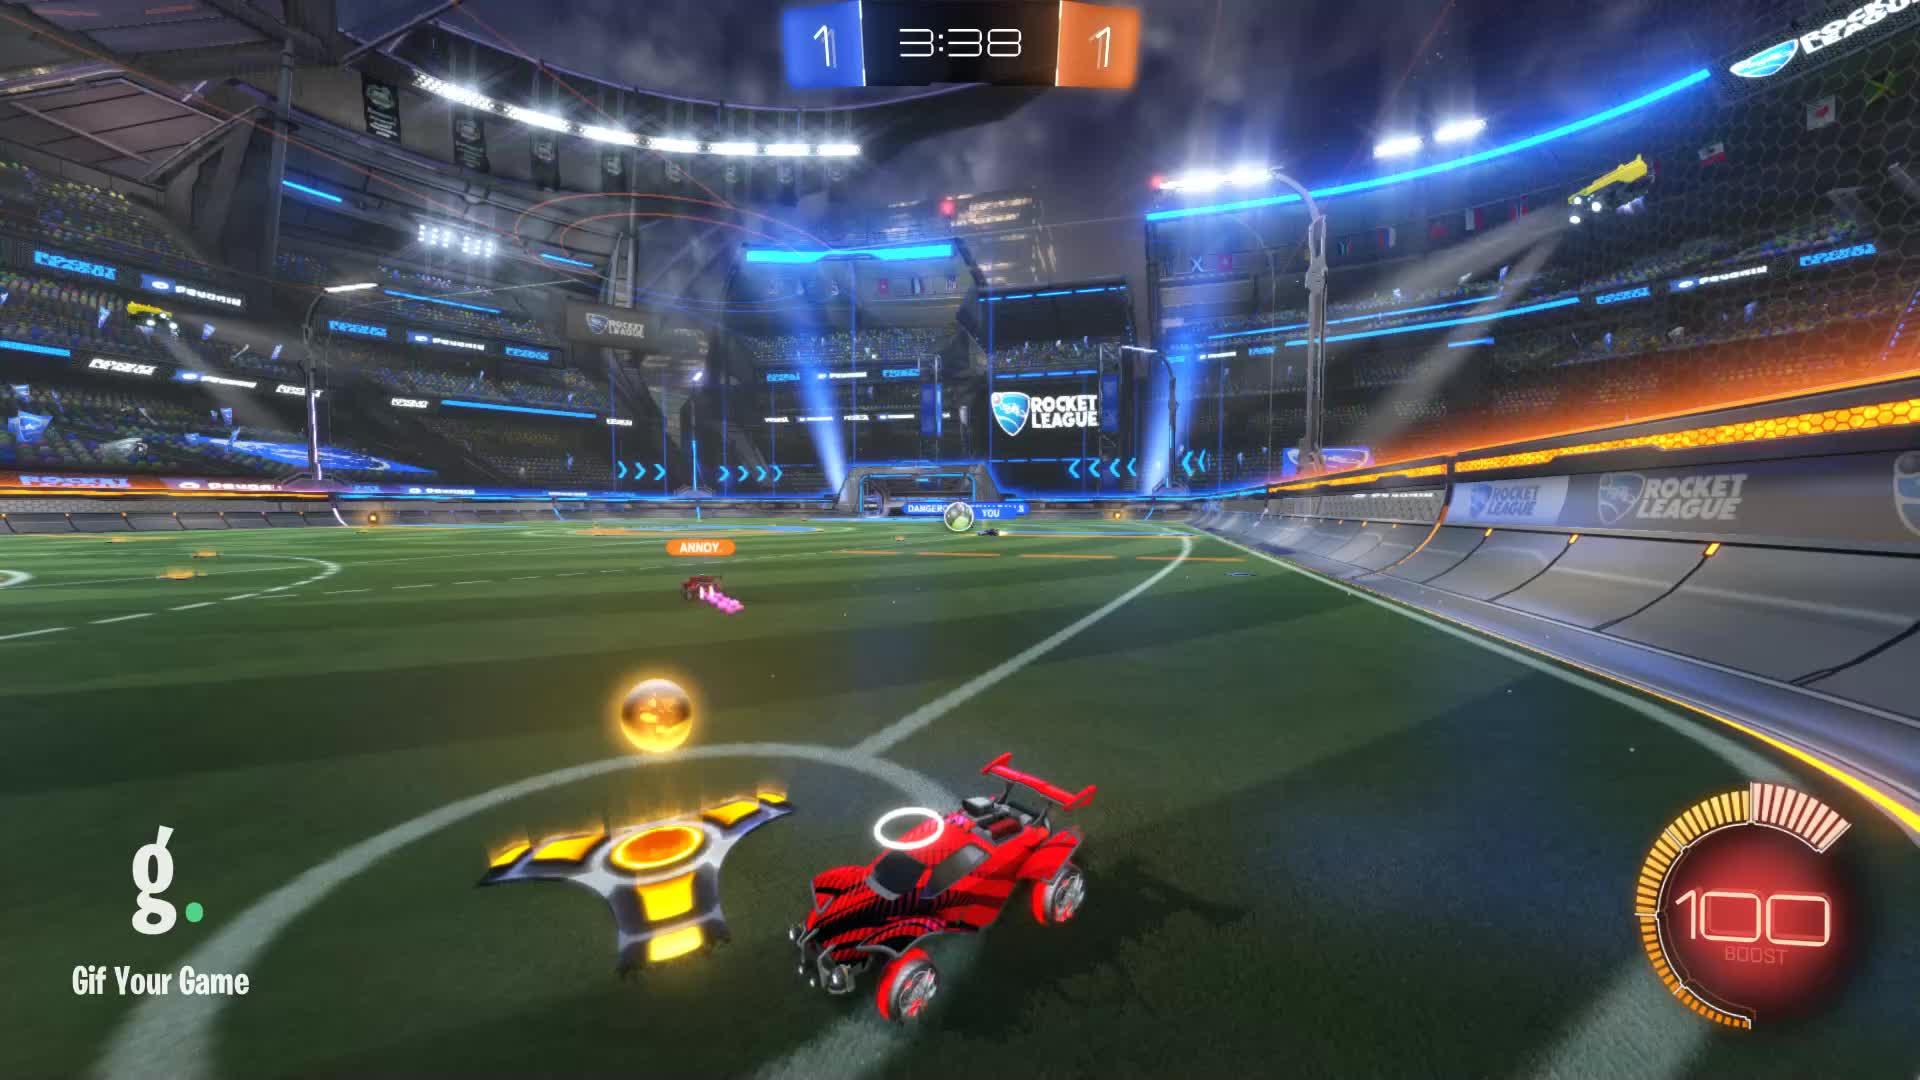 Gif Your Game, GifYourGame, Goal, Rocket League, RocketLeague, lilmoist., Goal 3: Annoy. GIFs